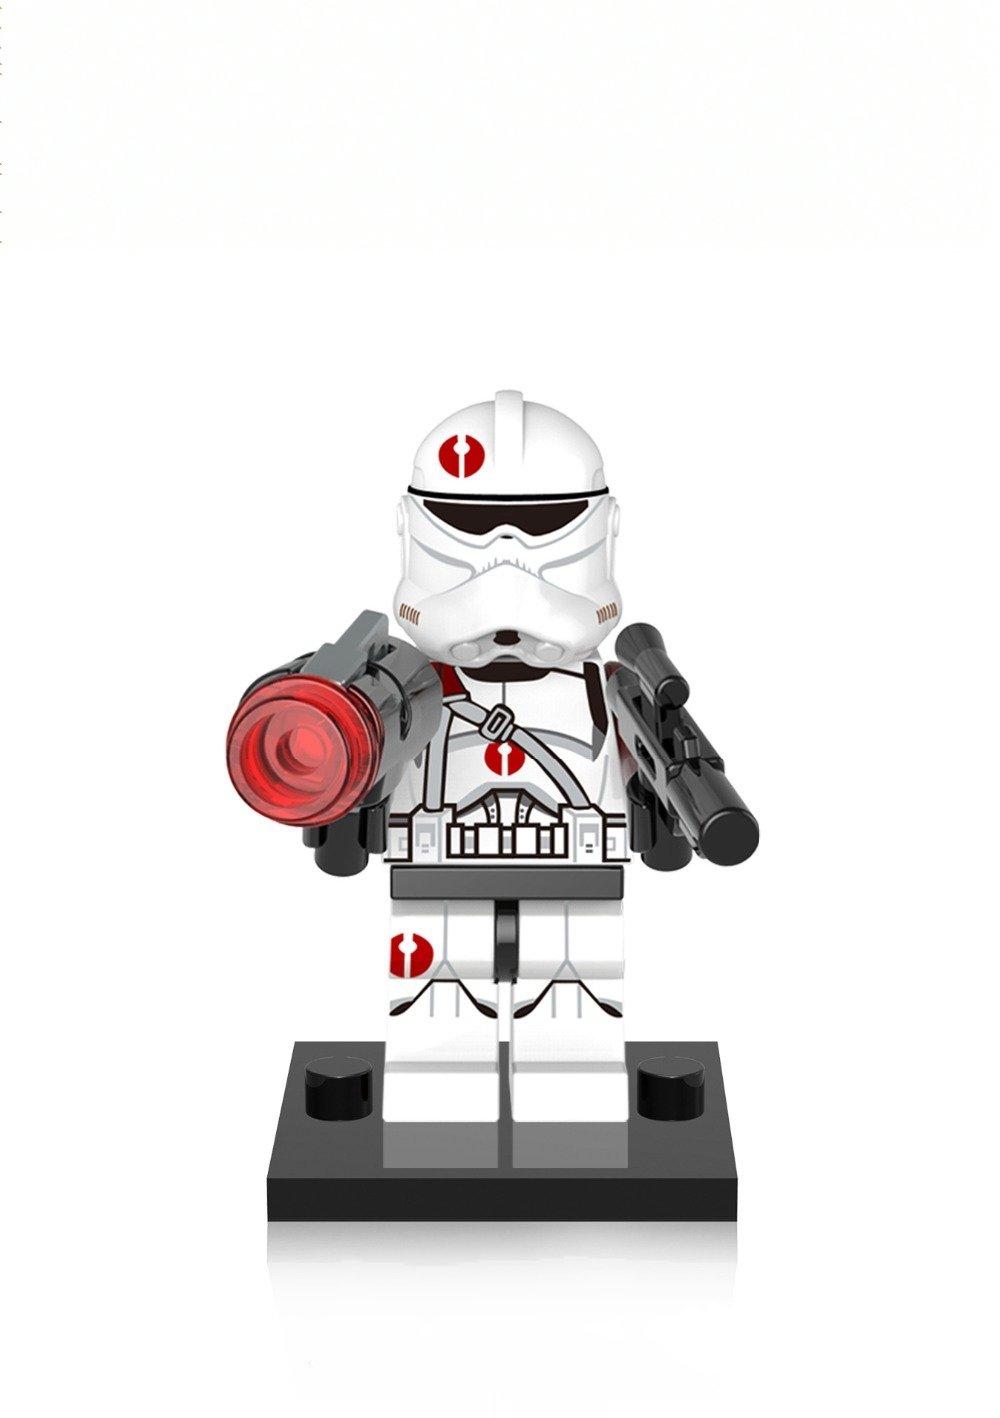 Commander Neyo Star Wars   Lego Minifigure Compatible toys